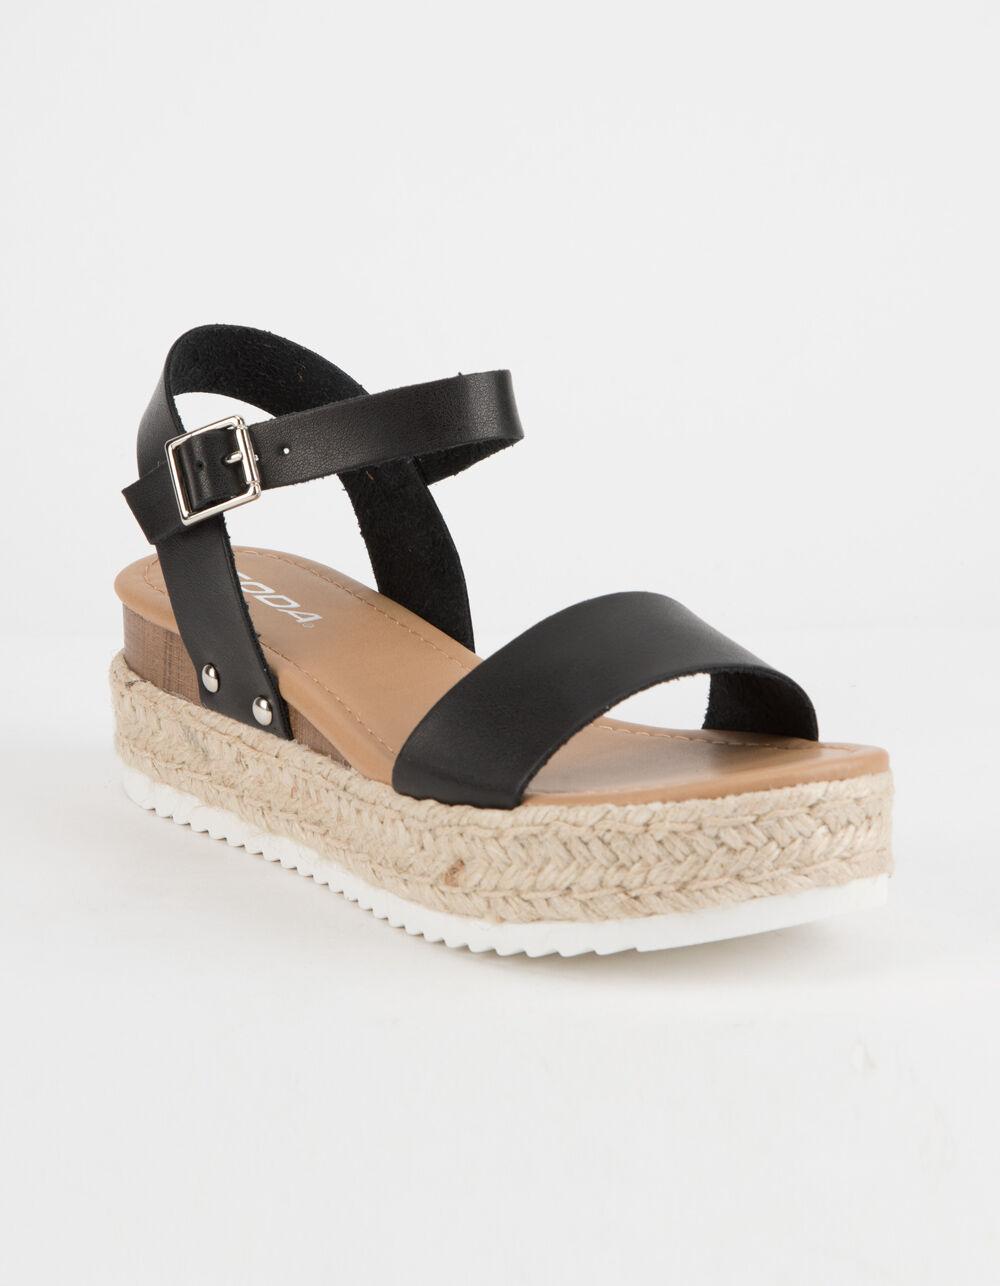 SODA Clip Black Espadrille Flatform Sandals